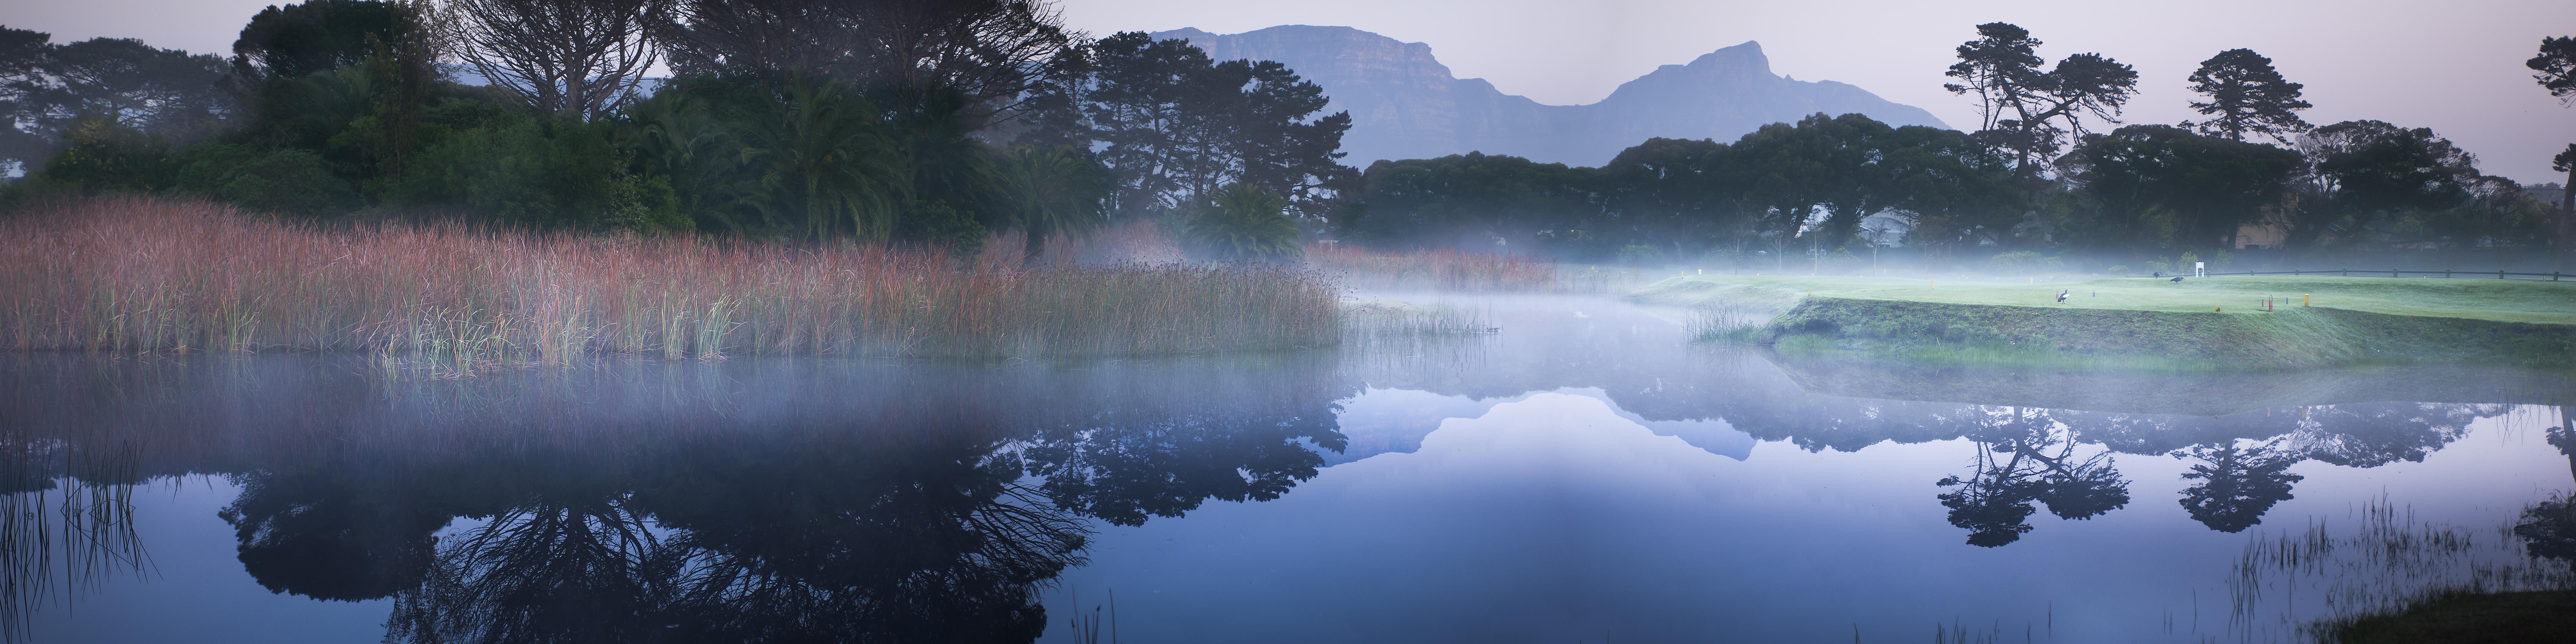 Early mornings at Royal Cape.